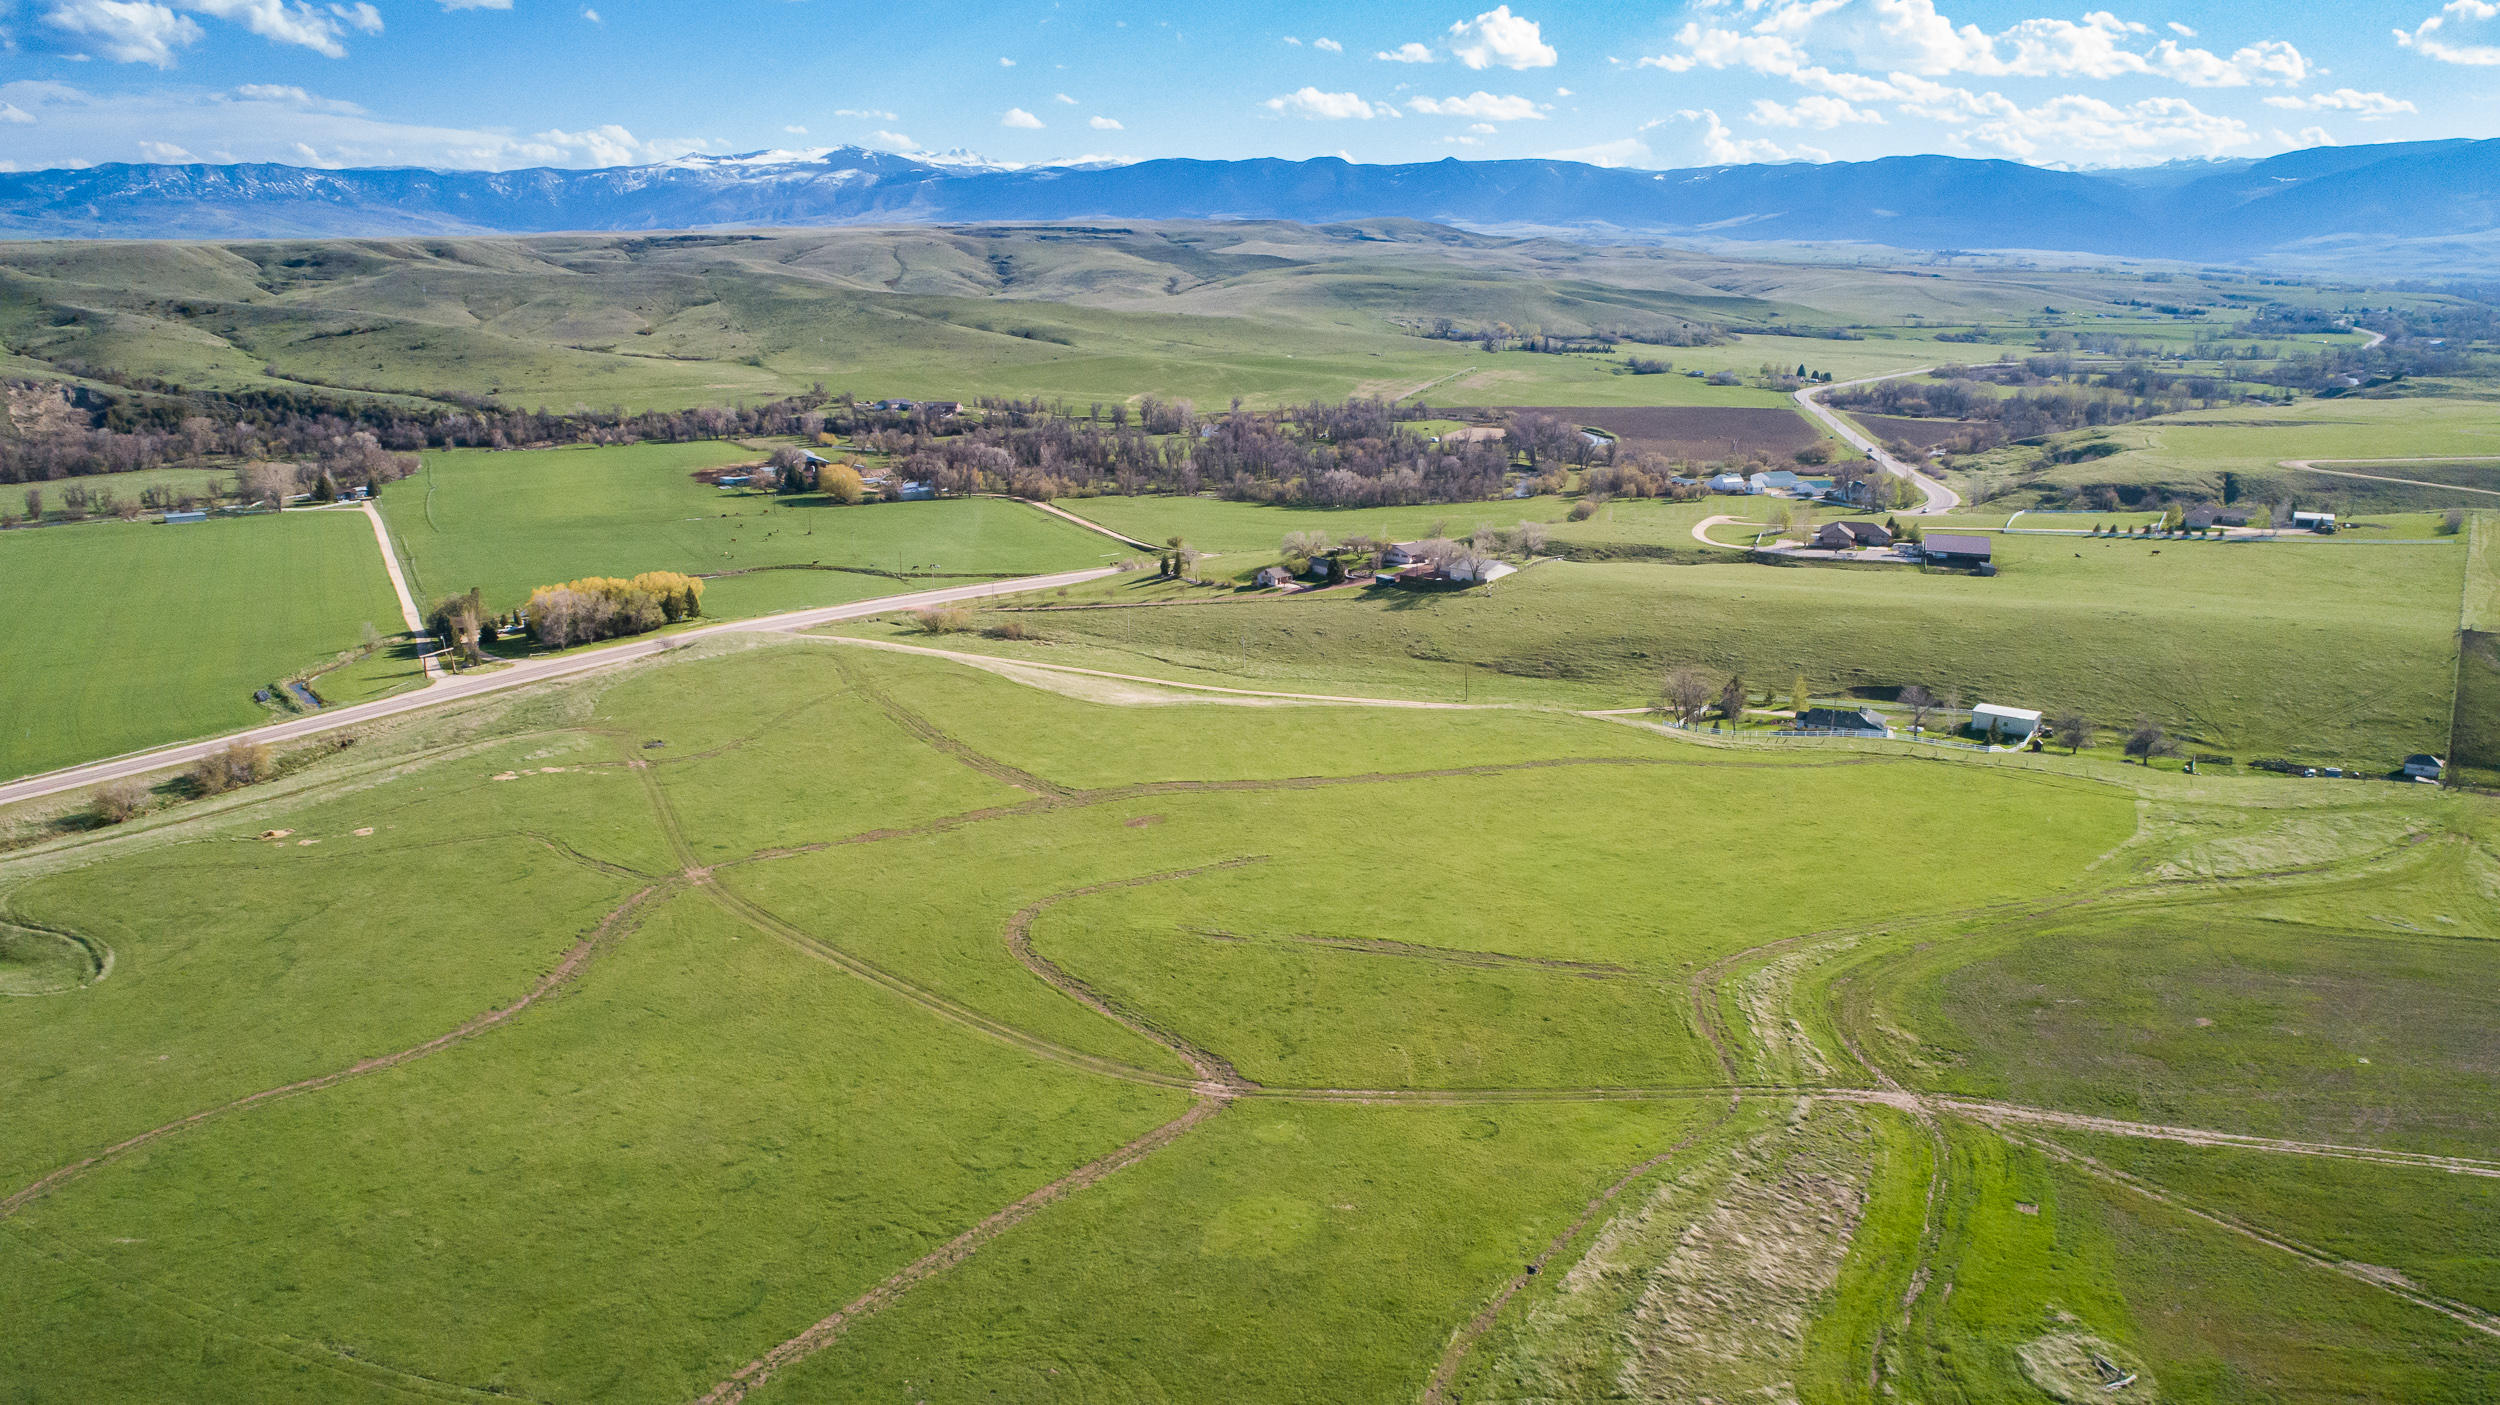 Lot 12 Scenic Lane, Sheridan, Wyoming 82801, ,Building Site,For Sale,Scenic,19-270